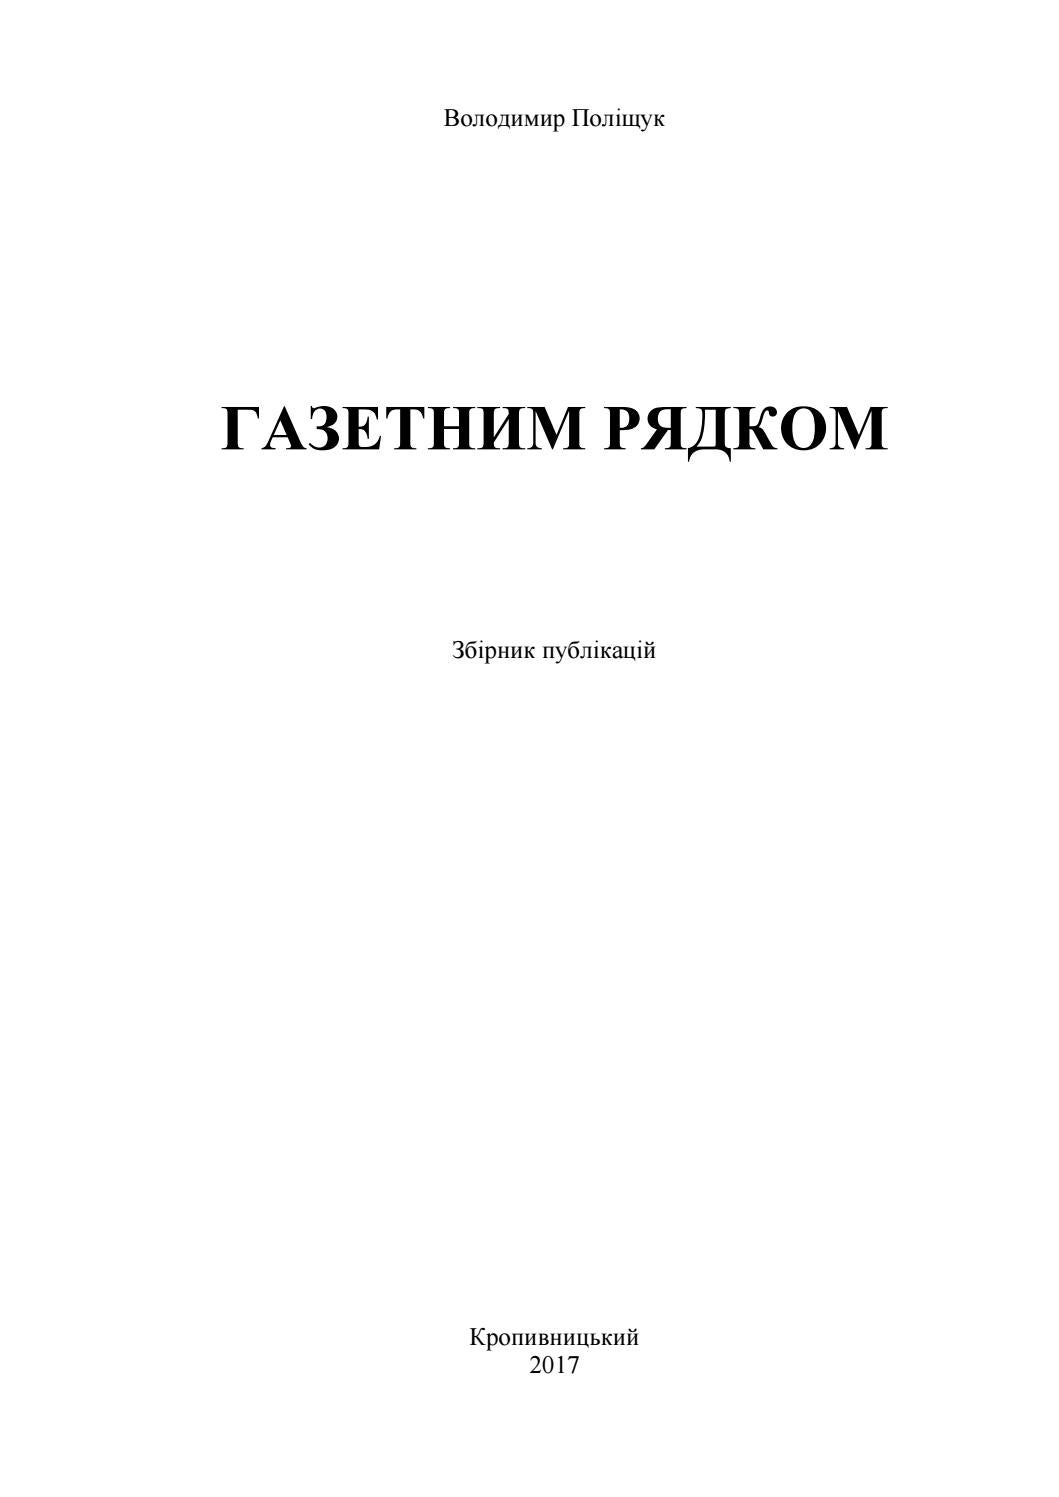 Володимир Поліщук. Газетним рядком. by Oleh Volokhin - issuu 22c47472ec3e9